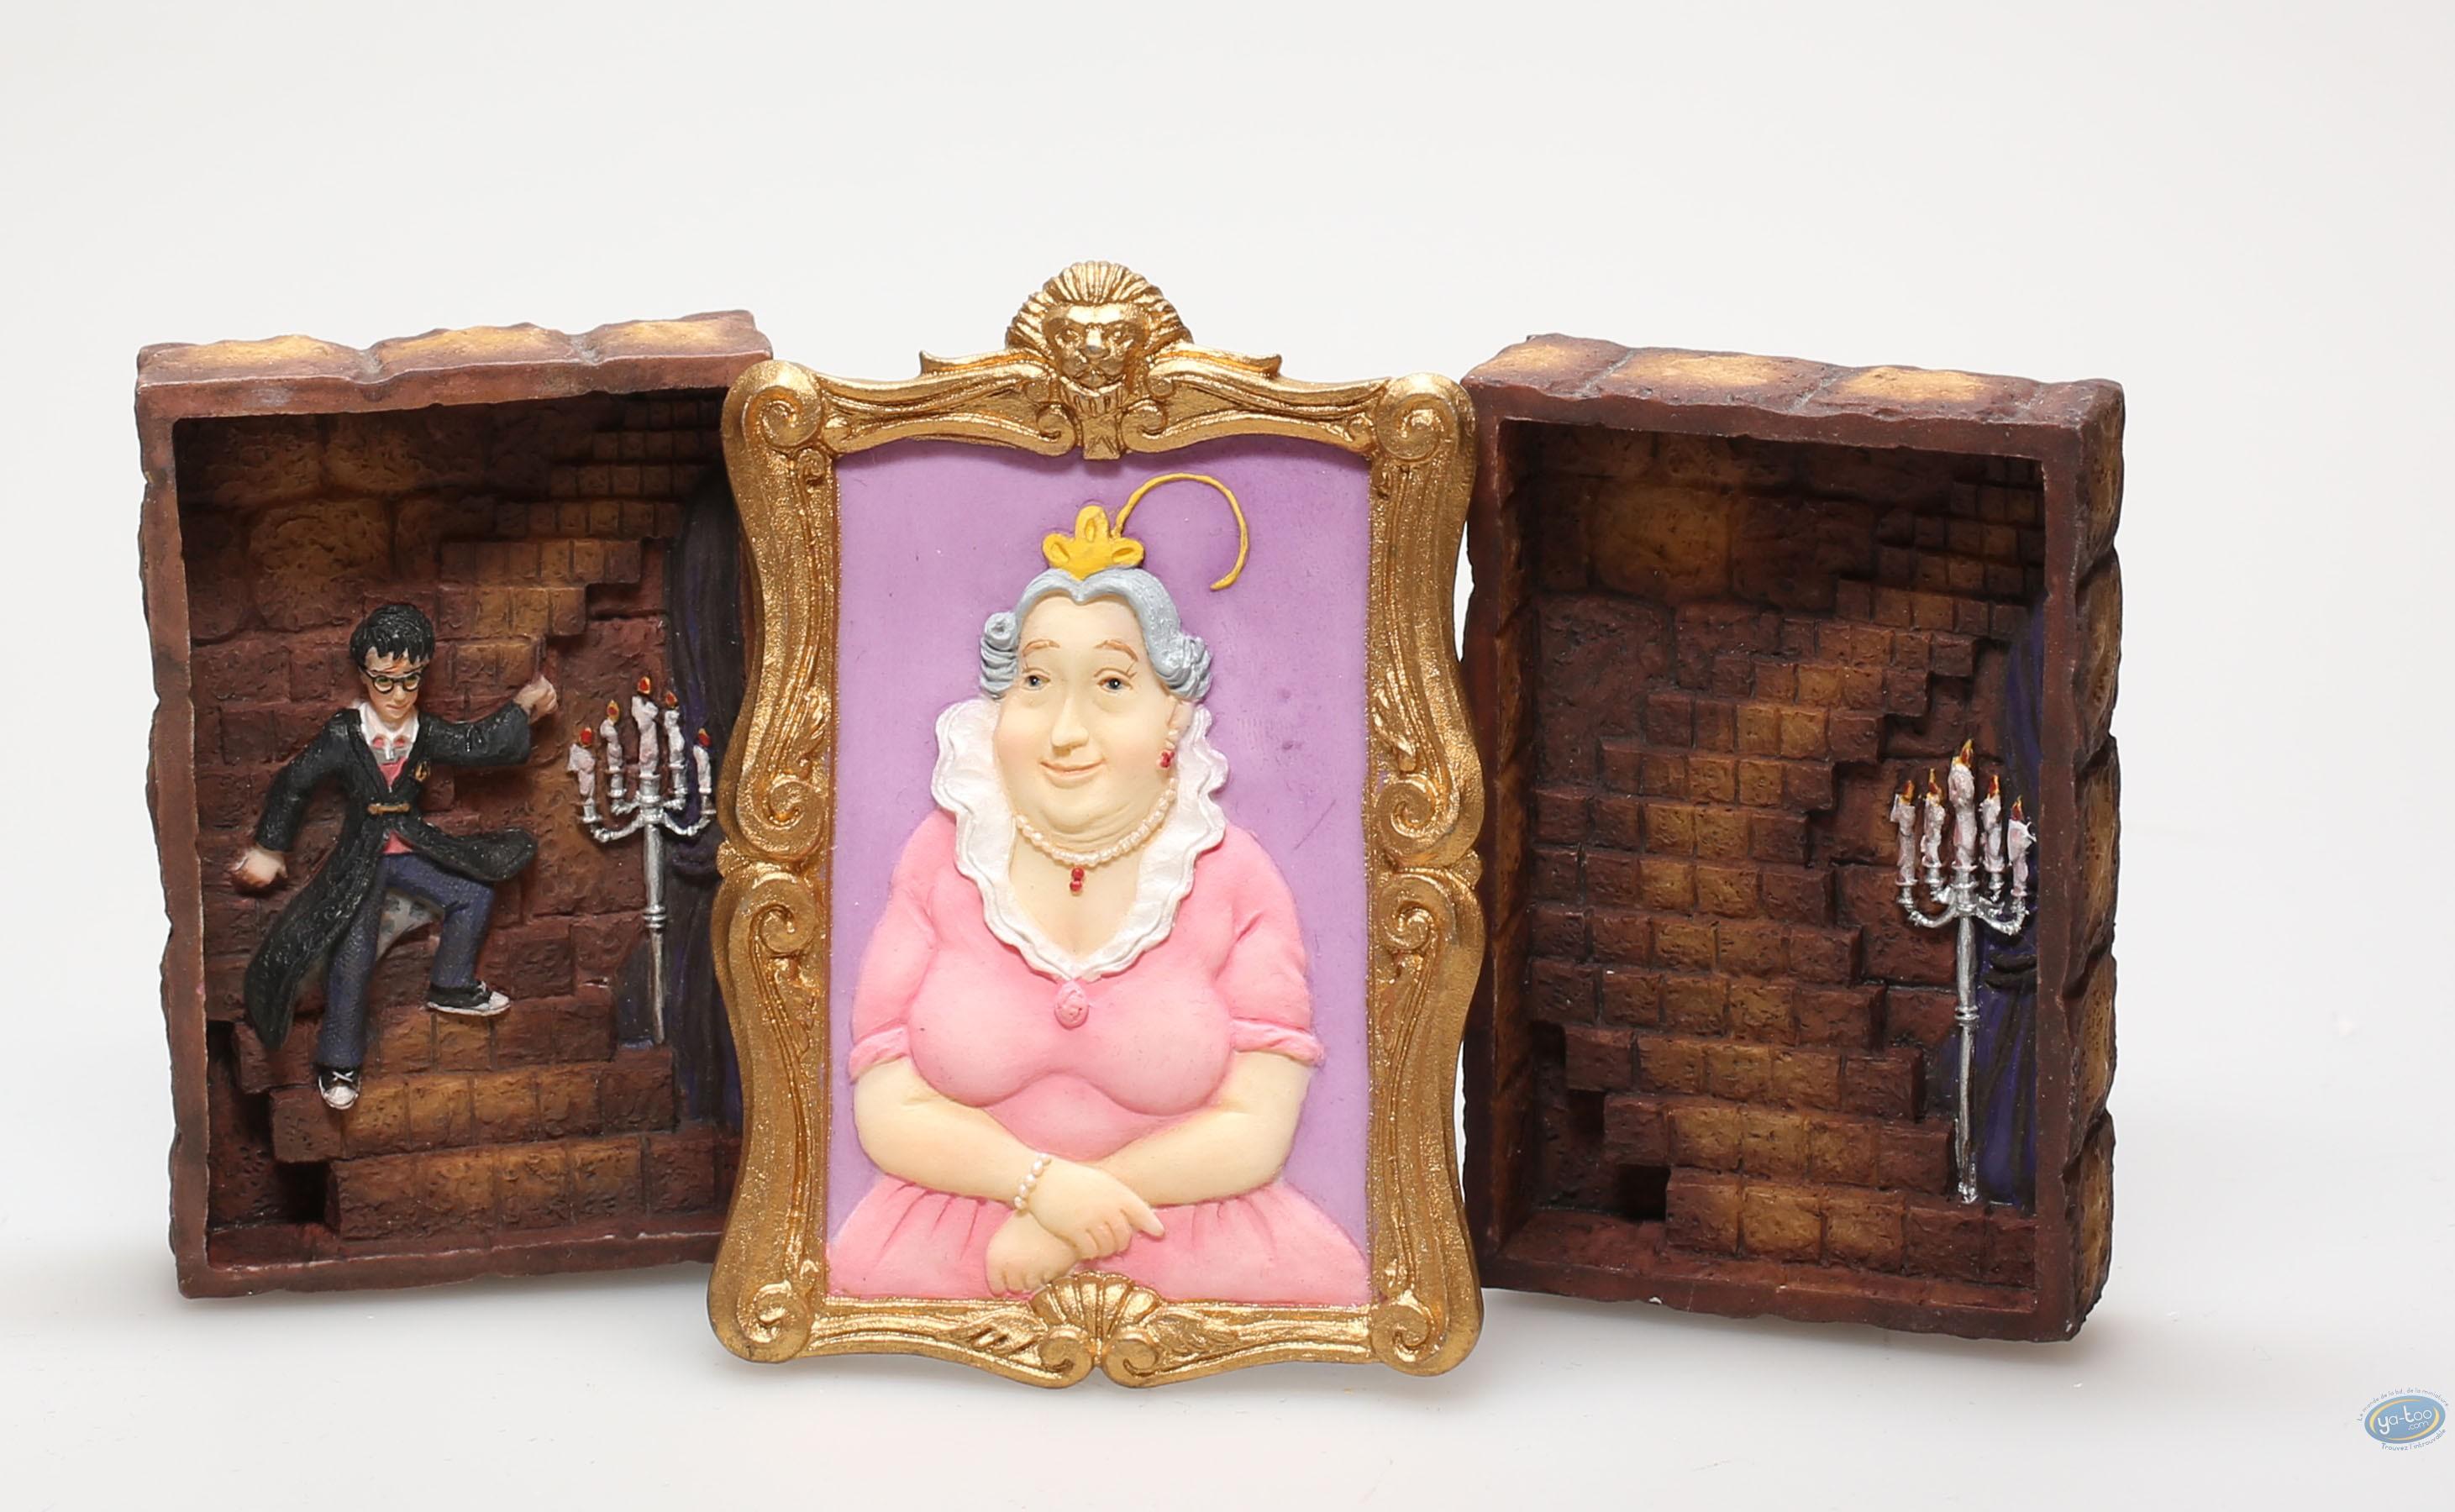 Resin Statuette, Harry Potter : Resin statue, Harry Potter : Fat lady Miror